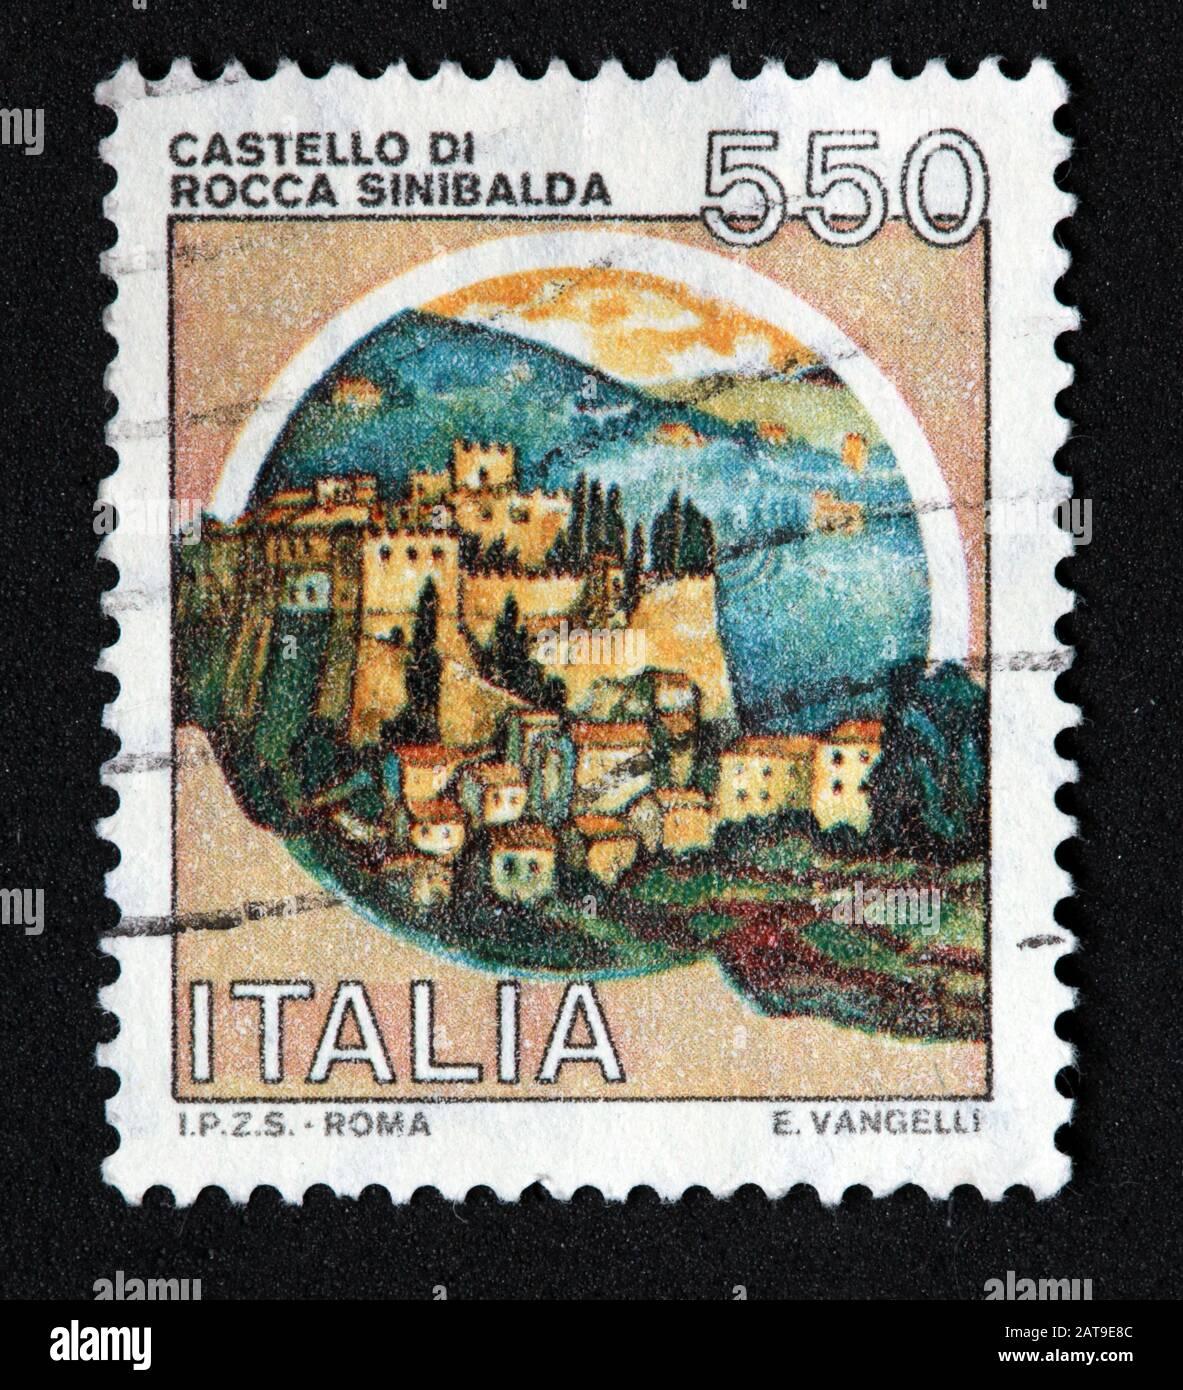 Dieses Stockfoto: Italienische Briefmarke, poste Italia benutzte und festlegte Stempel, Schlösser Italiens, Italia 550lire Castello Di Rocca Sinibalda - E.Vangelli - Roma - 2AT9E8